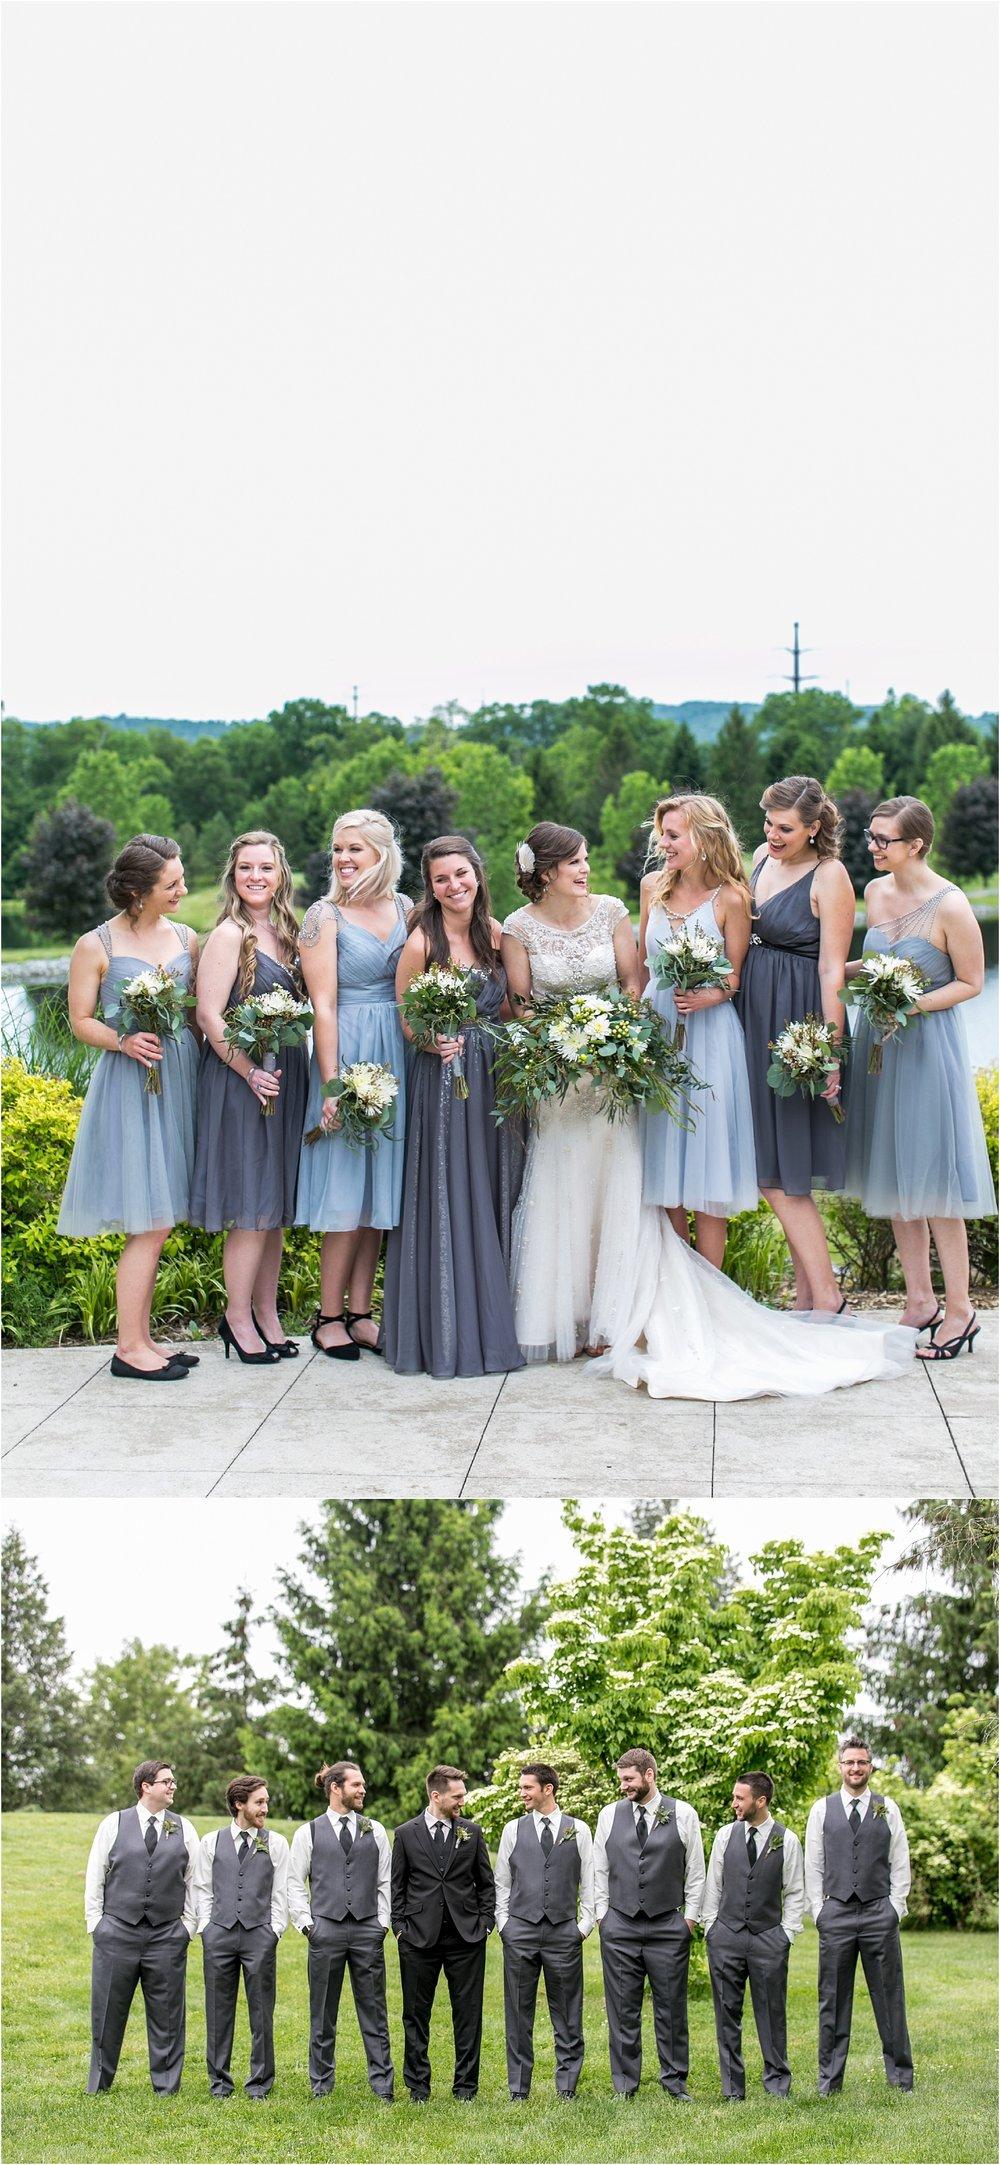 Smith Wedding Liberty Forge Golf Course Wedding Living Radiant Photography Photos_0098.jpg